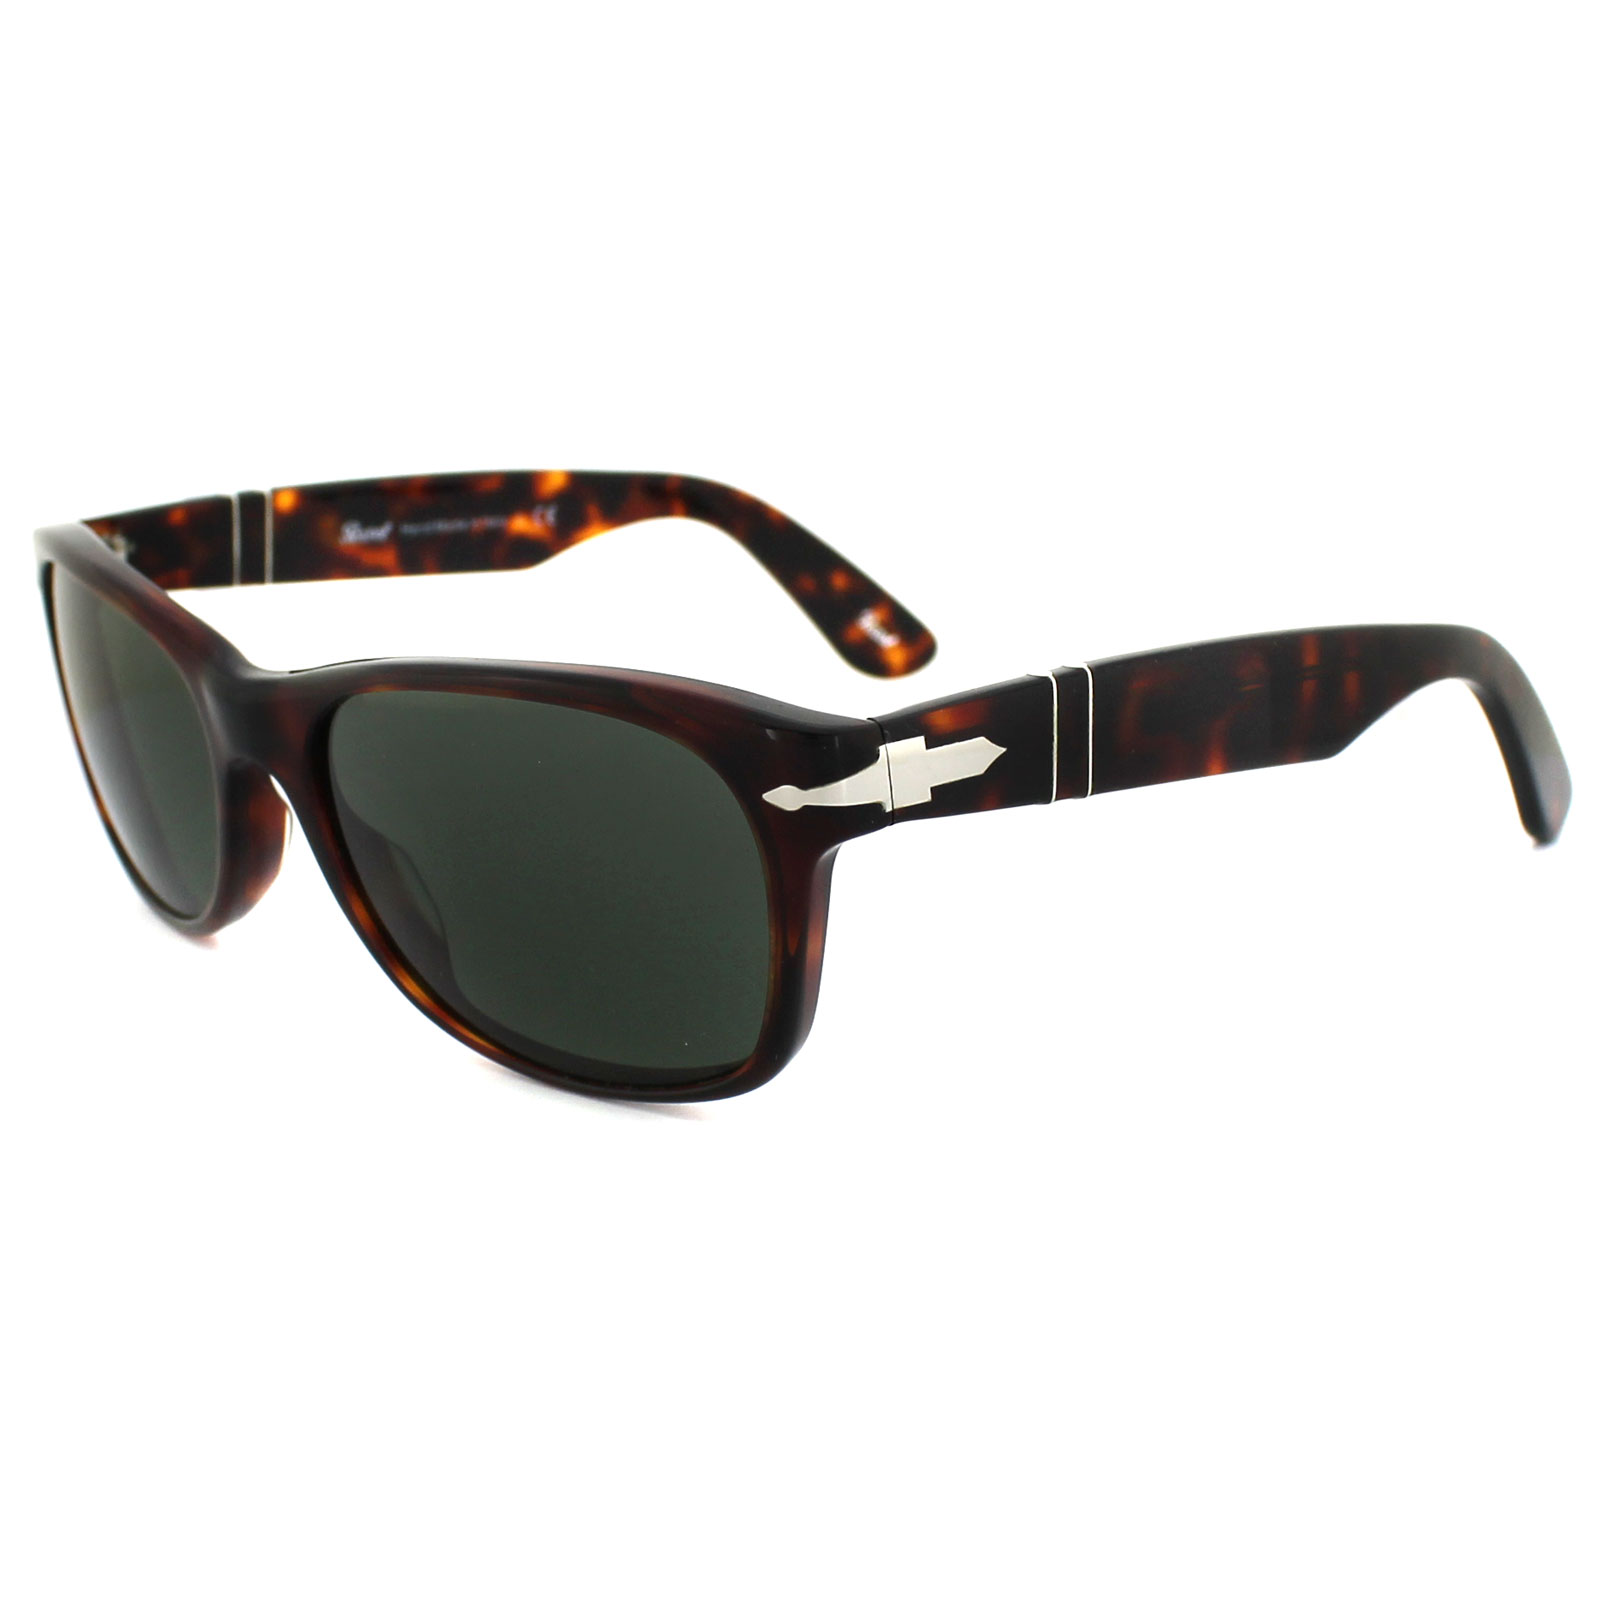 5b76b77ca44 Persol Sunglasses 2953 24 31 Havana Grey